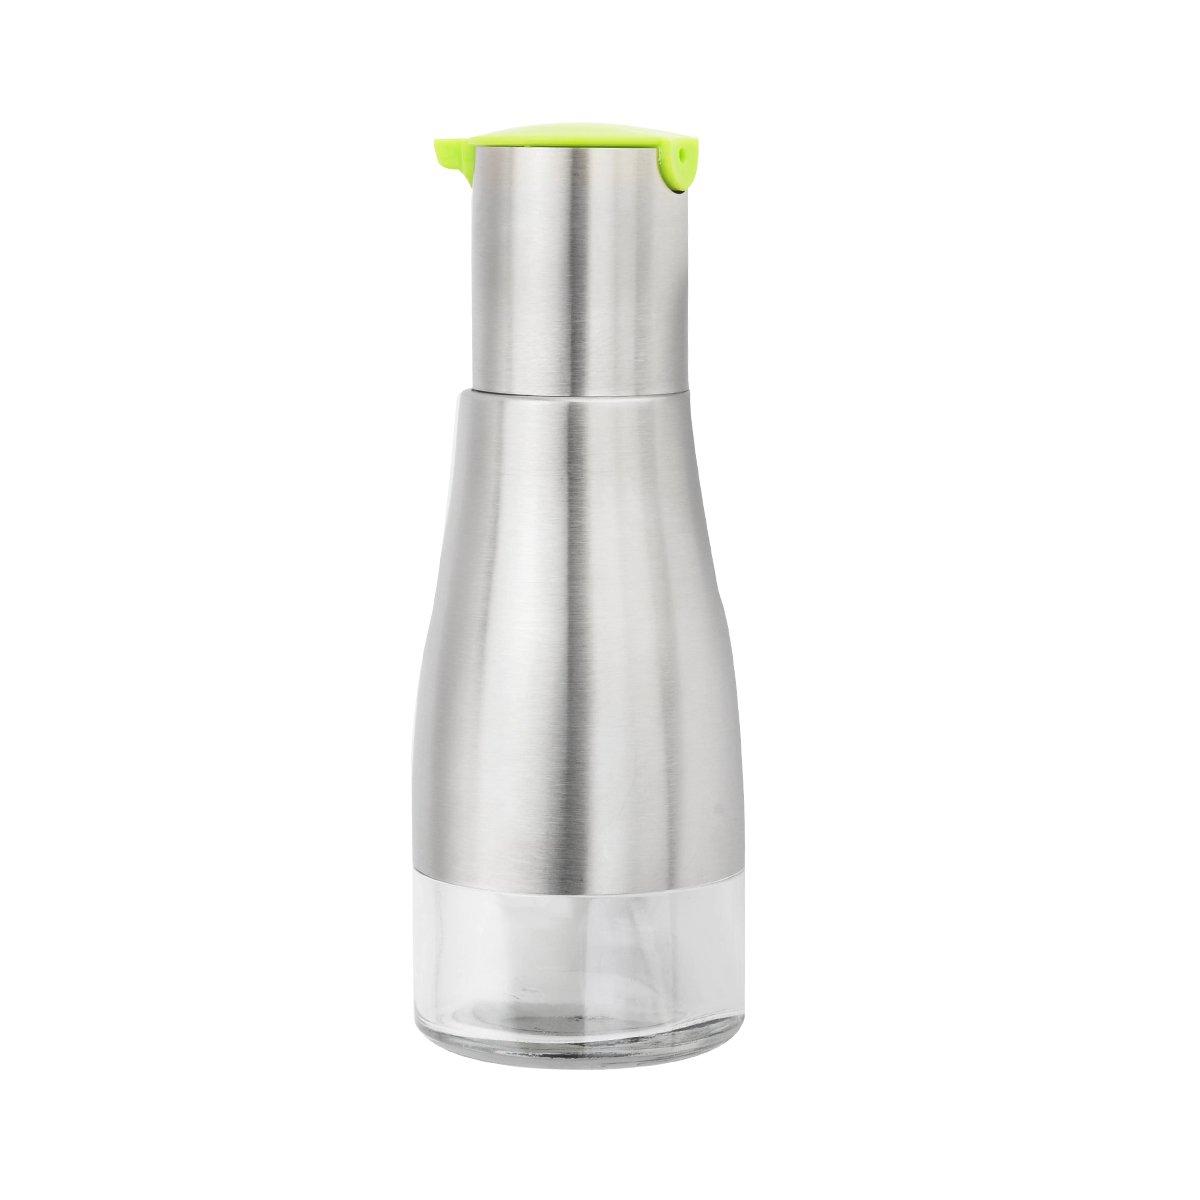 LONGLISHENG Stainless Steel Glass Oiler Leak-Proof Vinegar Bottle Condiment Sauce Container Kitchen Gadget